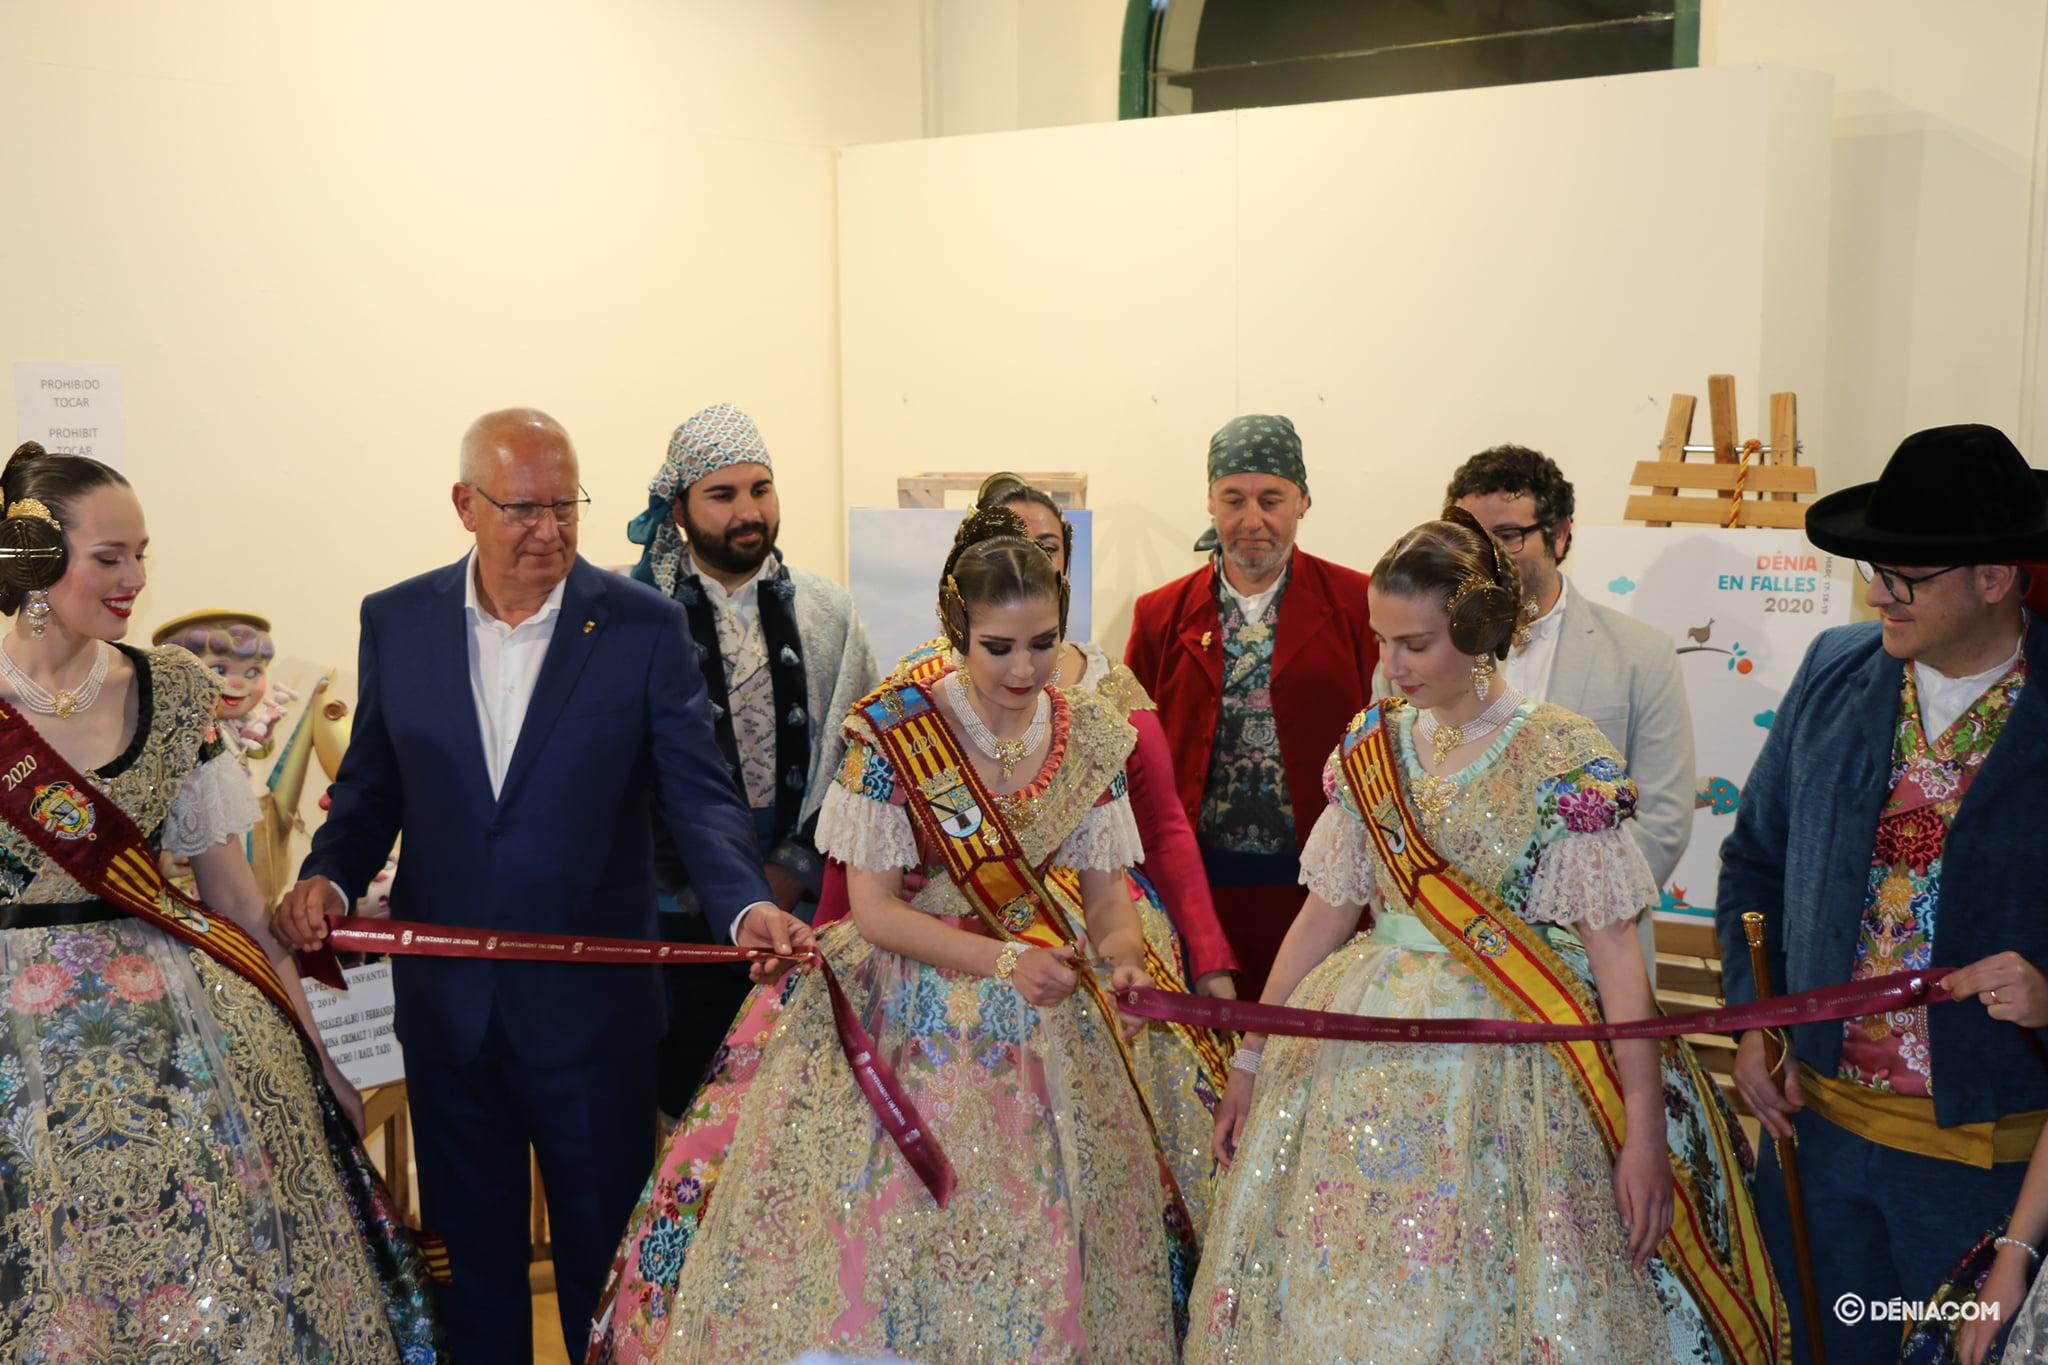 Inauguration Exhibition of Ninot 2020 05